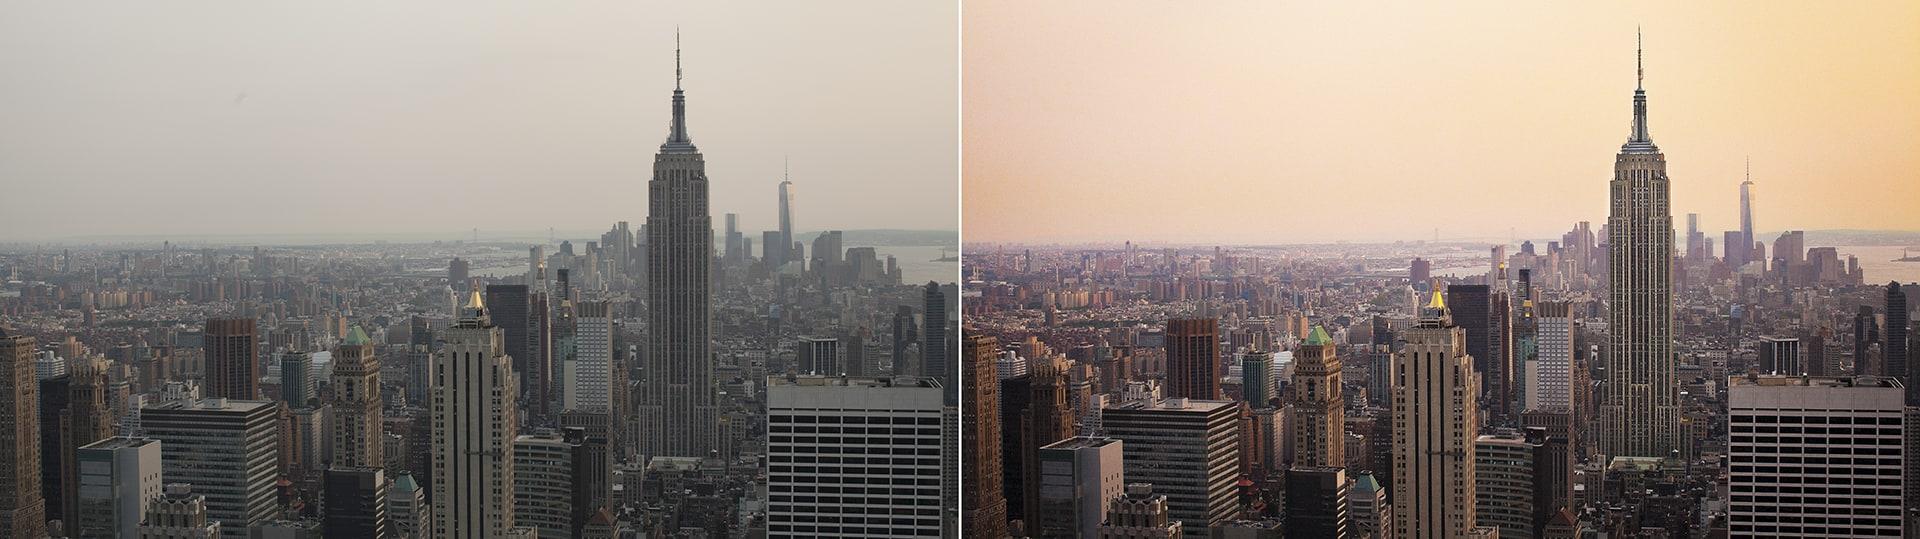 tuto lightroom paysage urbain new york avant apres